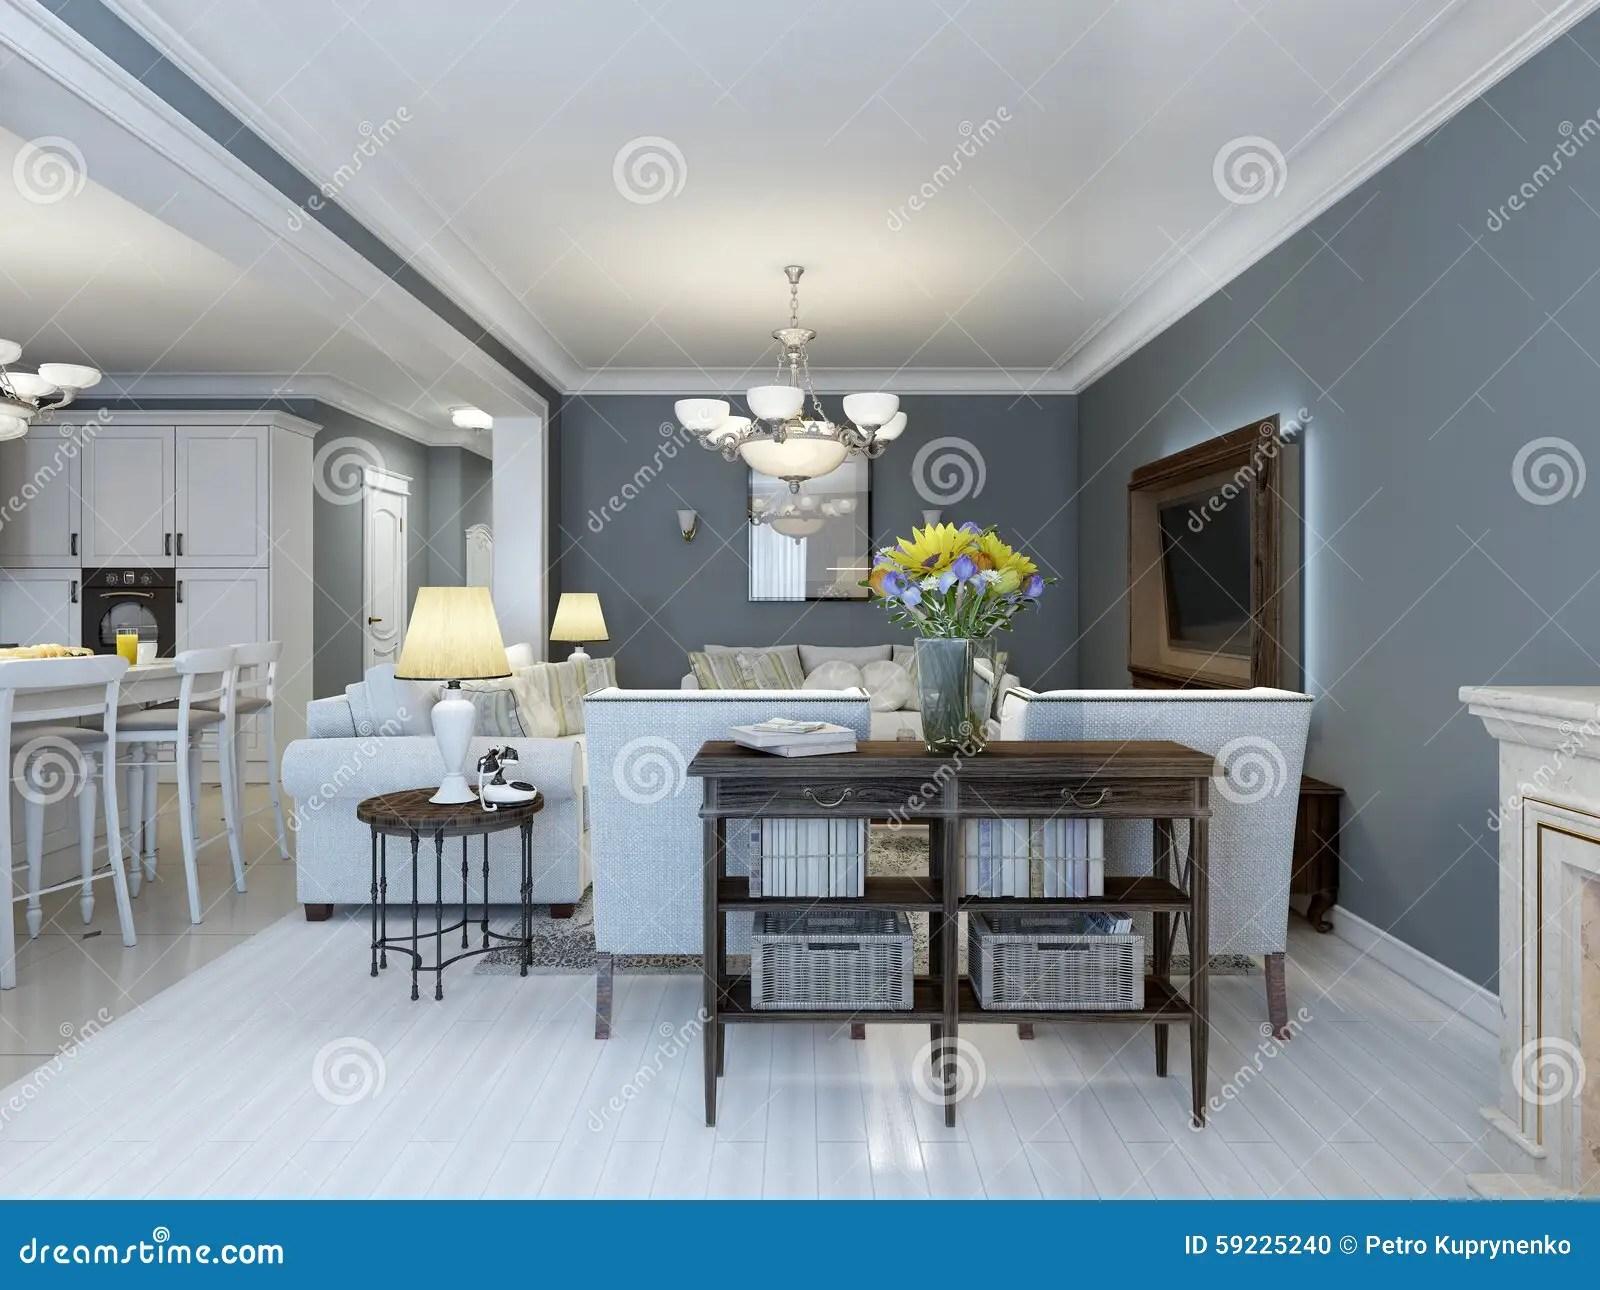 navy blue kitchen decor bowls 普罗旺斯卧室想法有白色家具的库存照片 图片包括有装饰 机柜 控制台 普罗旺斯卧室想法有白色家具的白色镶花地板 海军墙壁 厨房背景的和壁炉3d回报